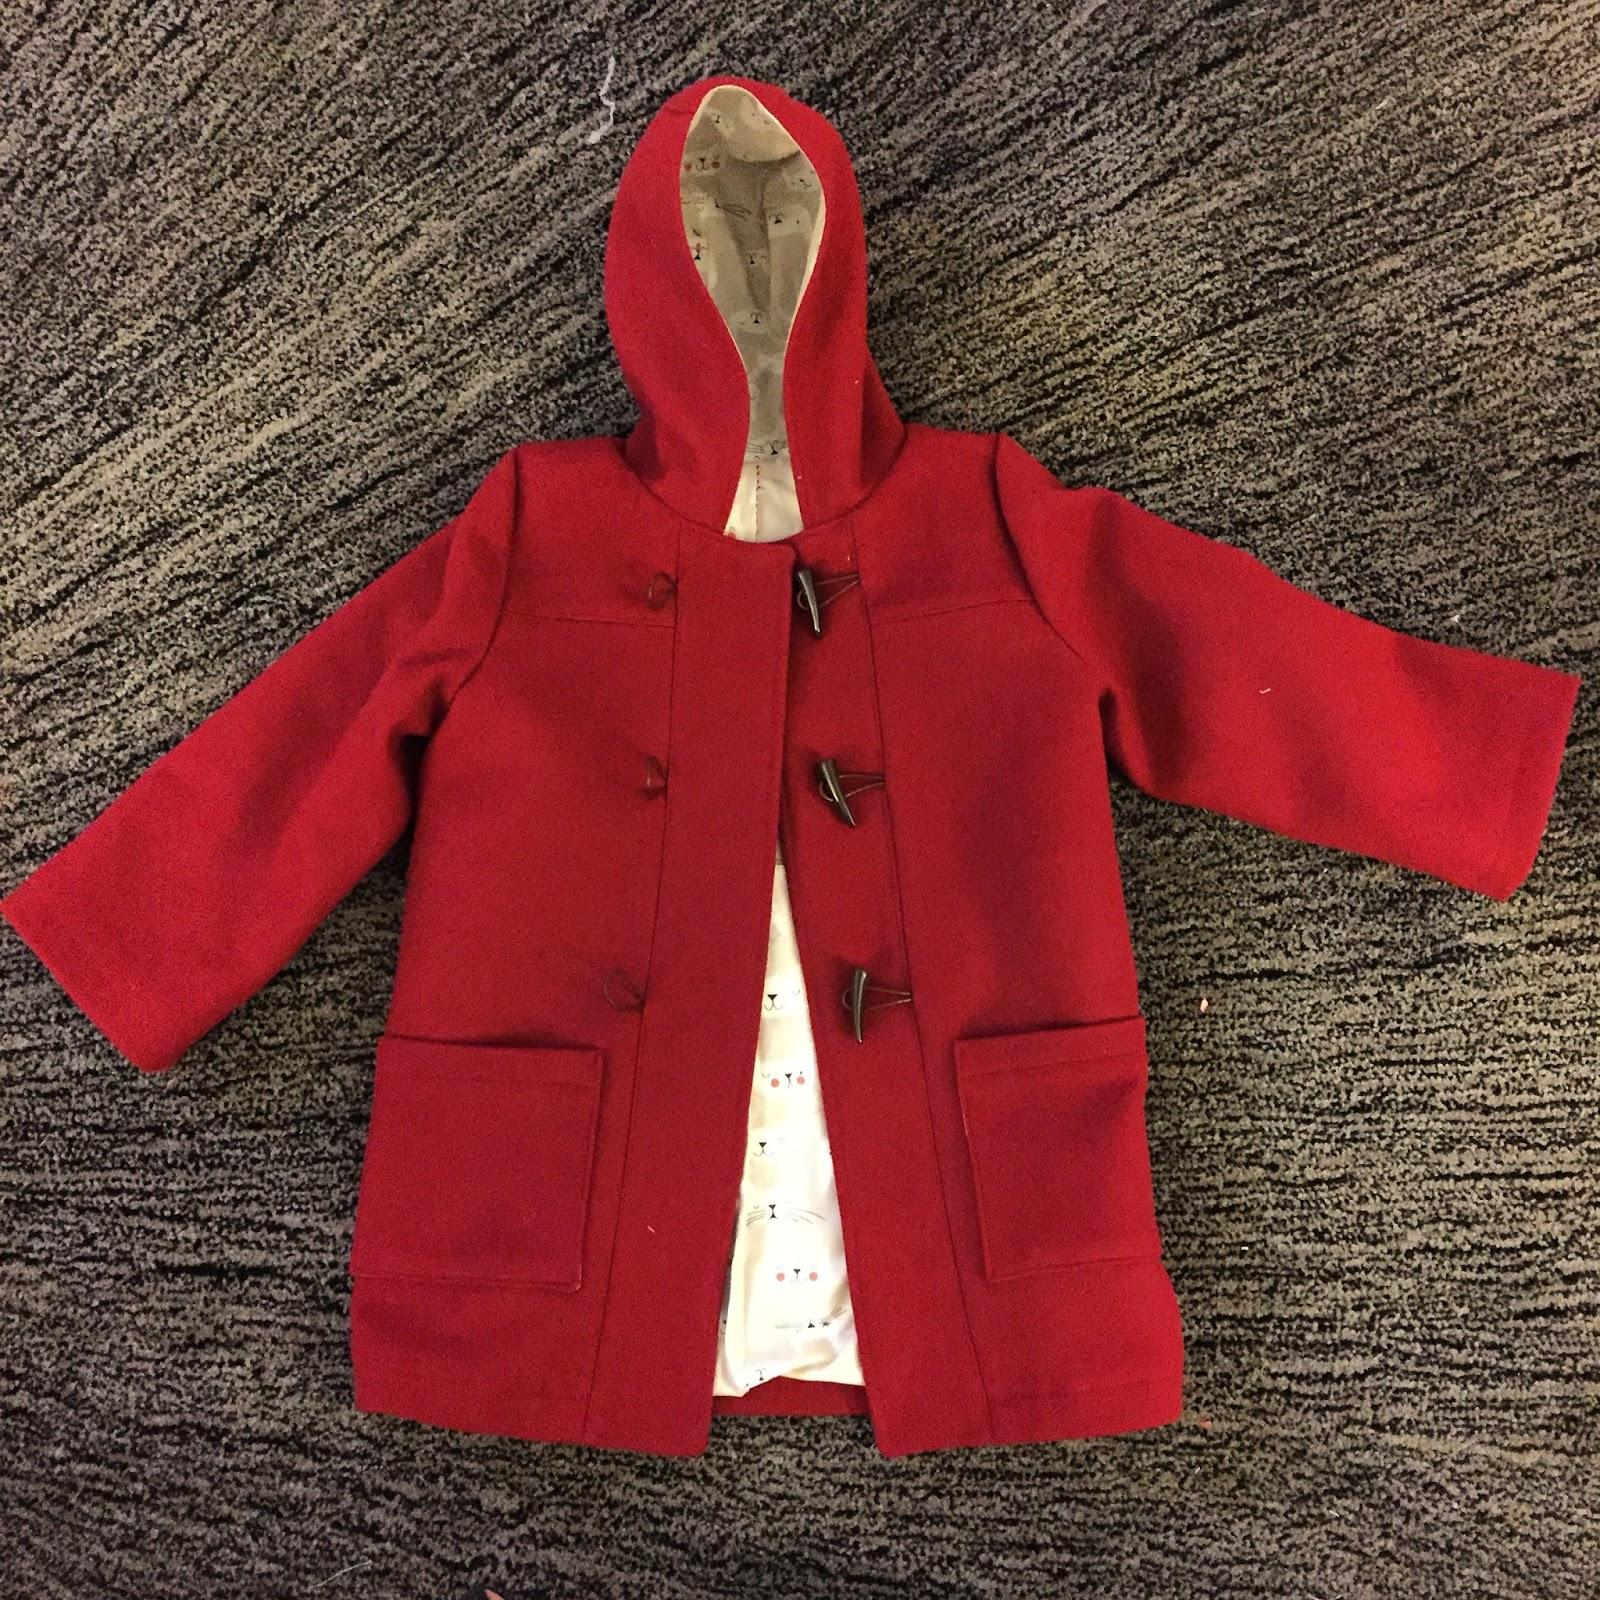 Oliver + S School Days jacket